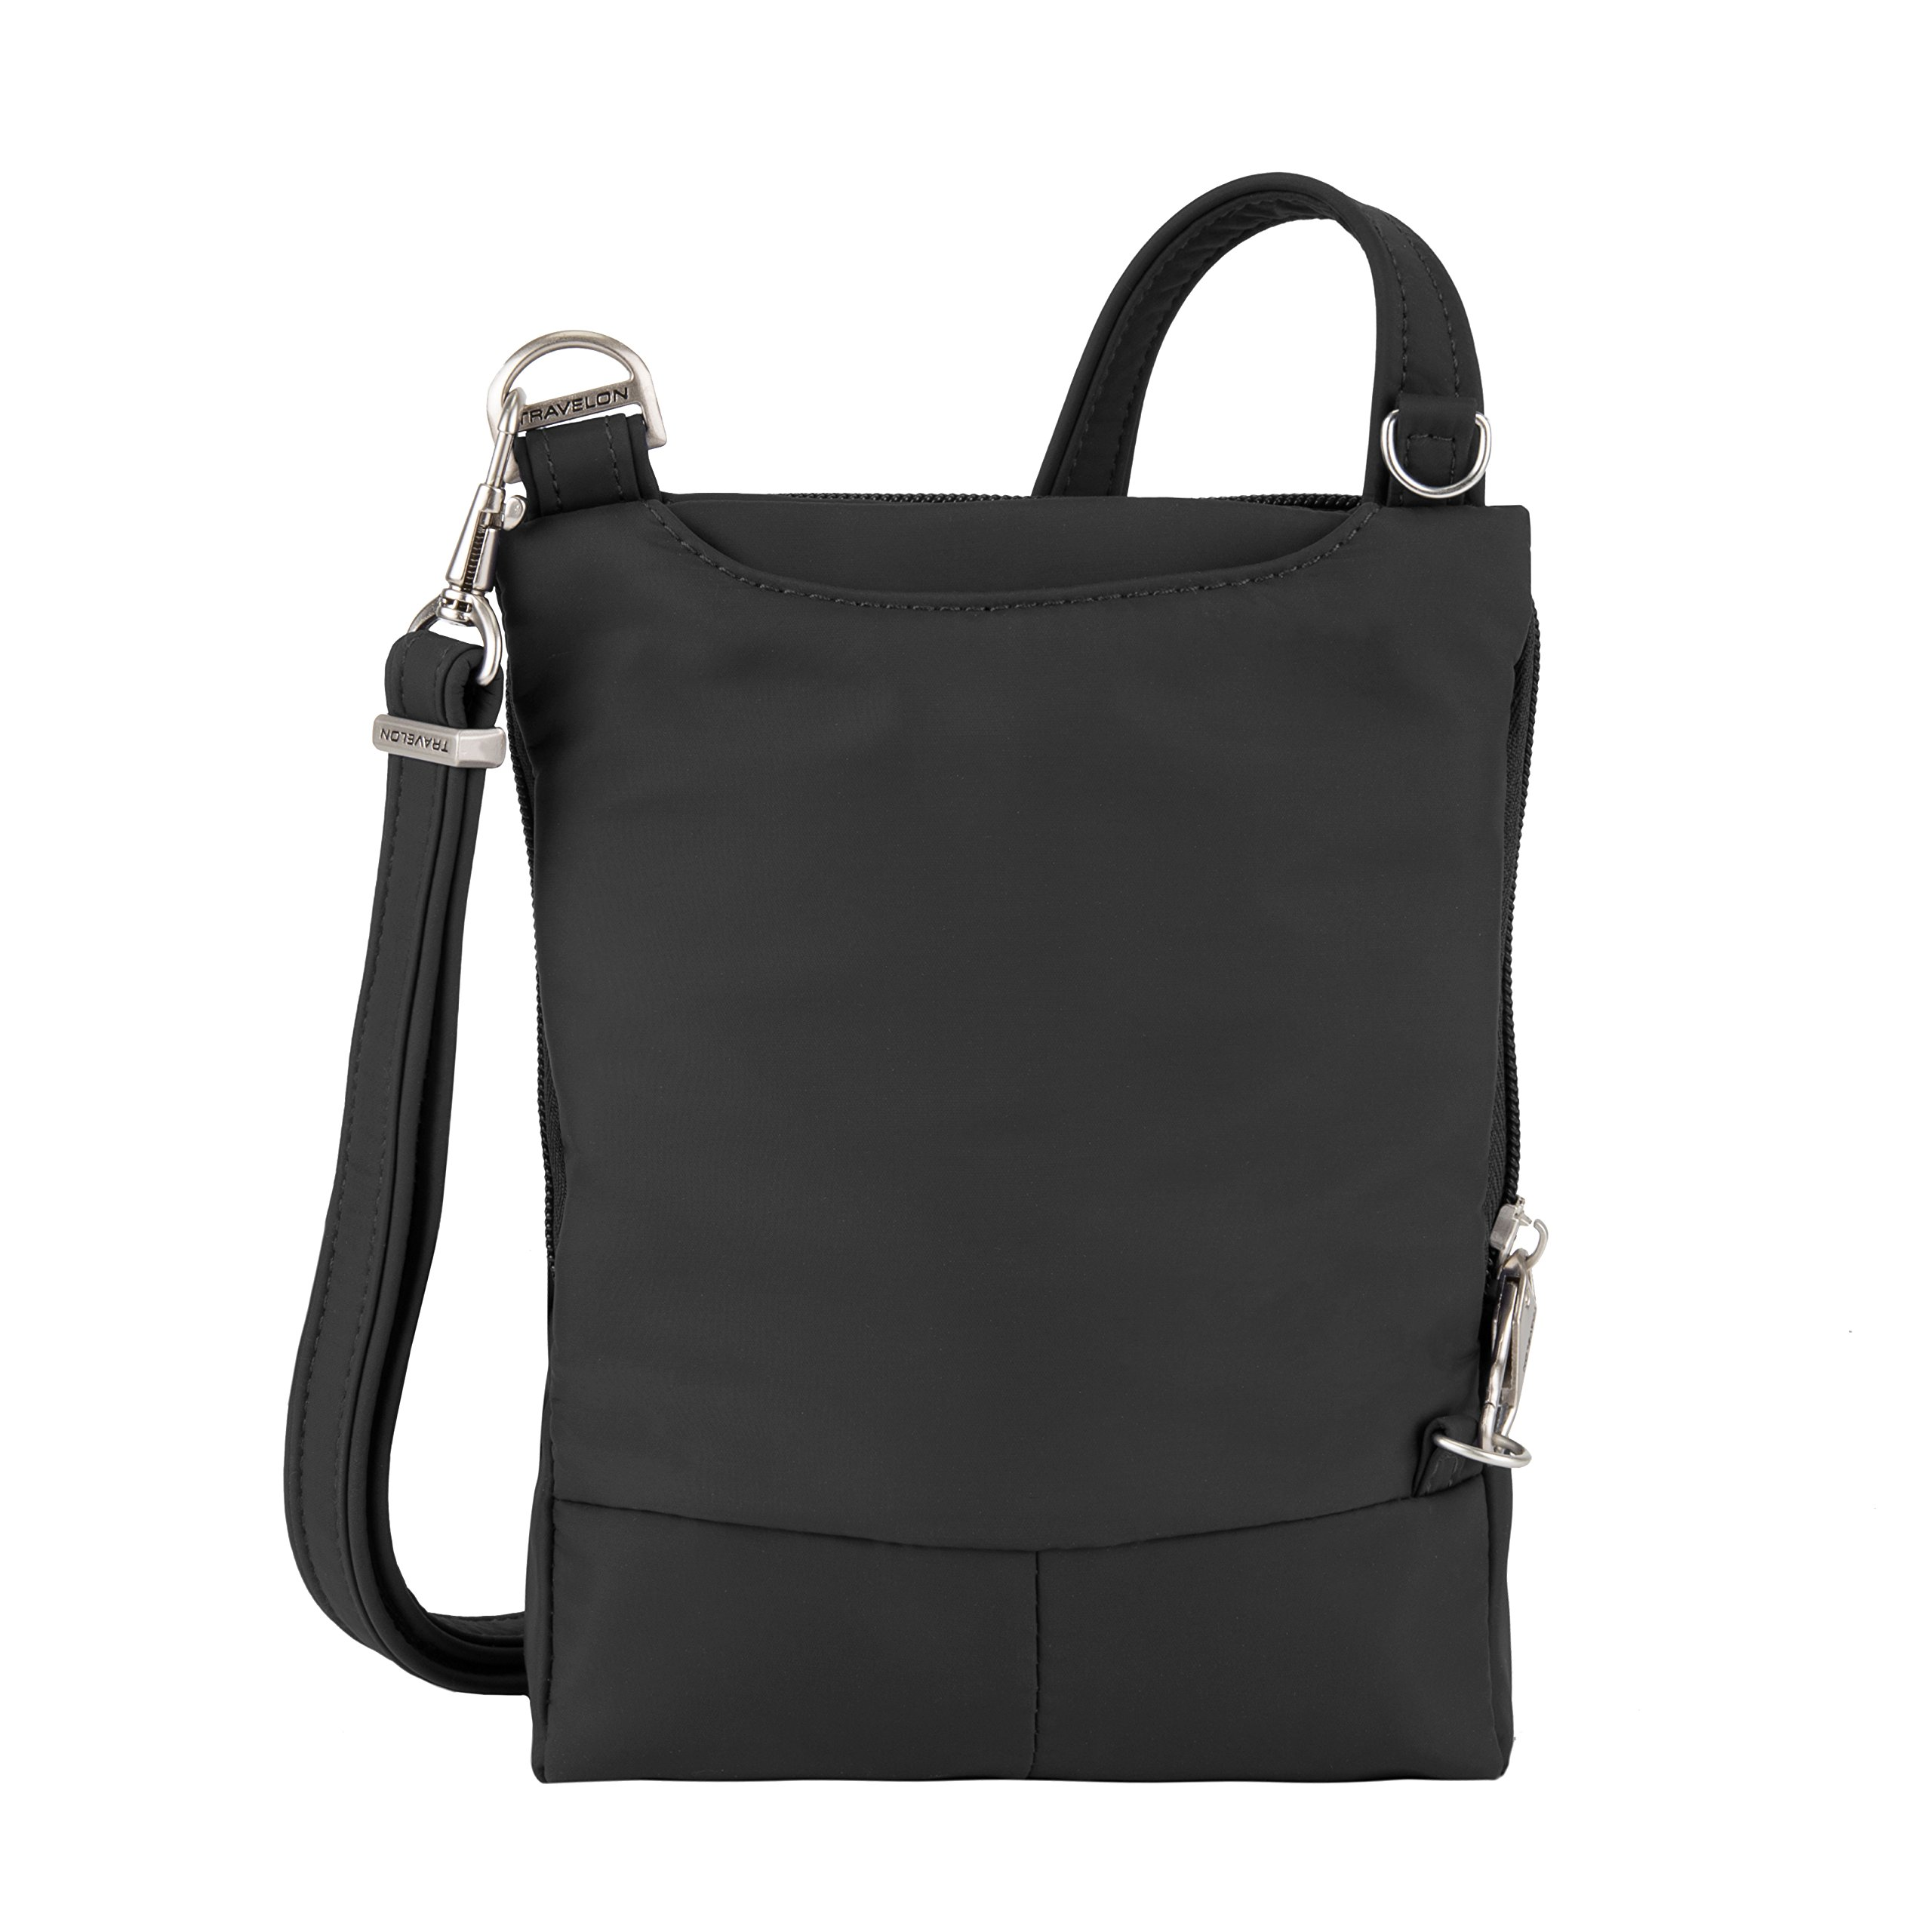 Travelon Anti-Theft Classic Light Mini Crossbody Bag, Black by Travelon (Image #8)